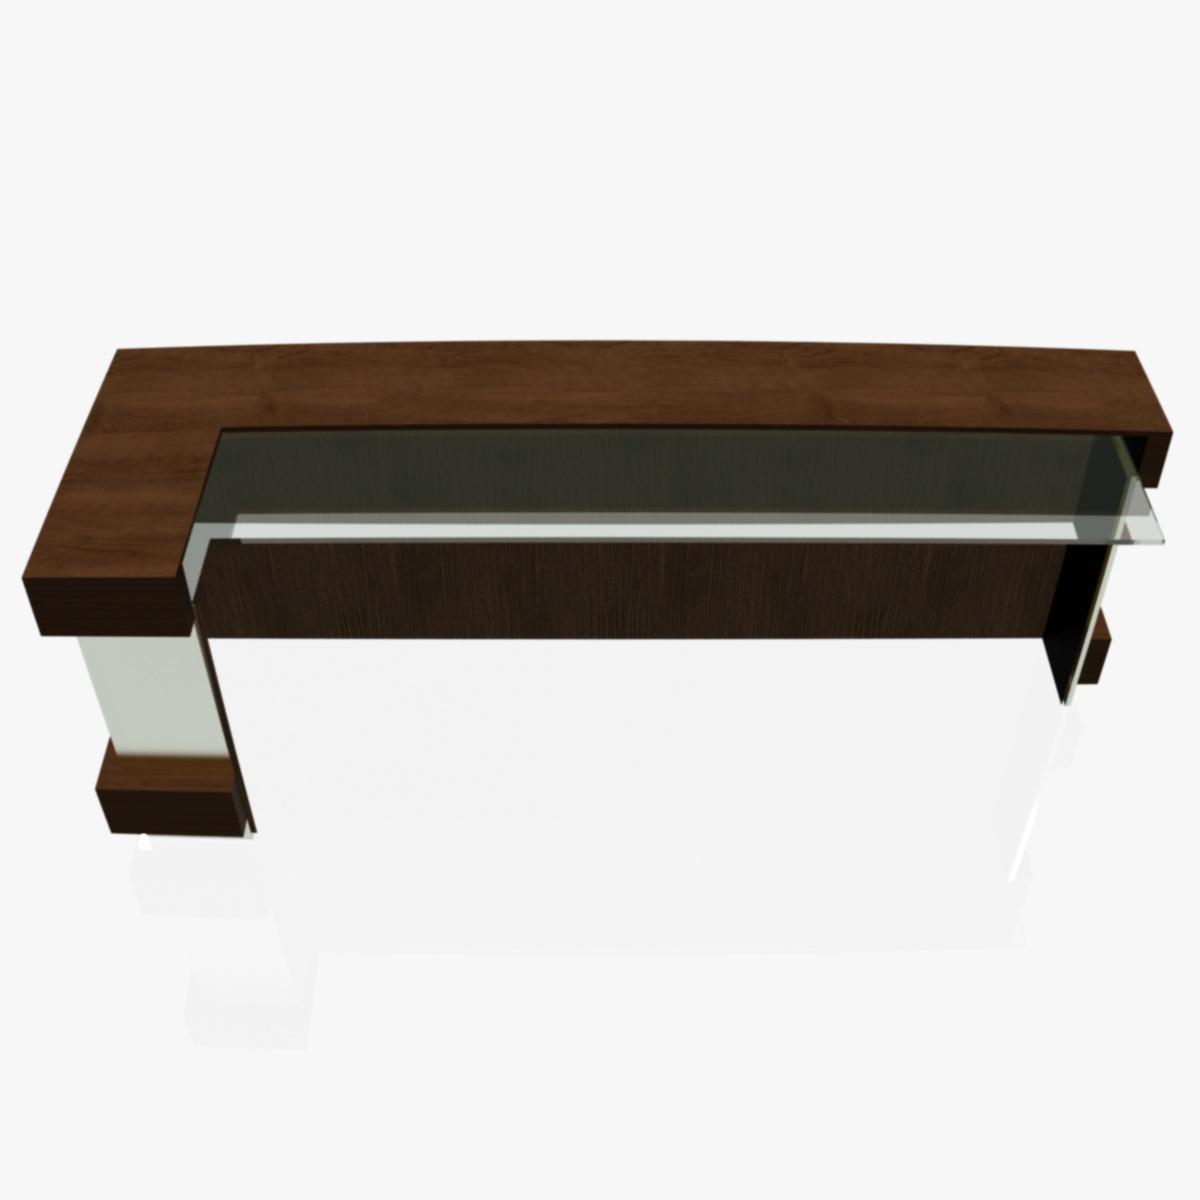 reception desk 1 3d model 3ds max dxf fbx  obj 219858